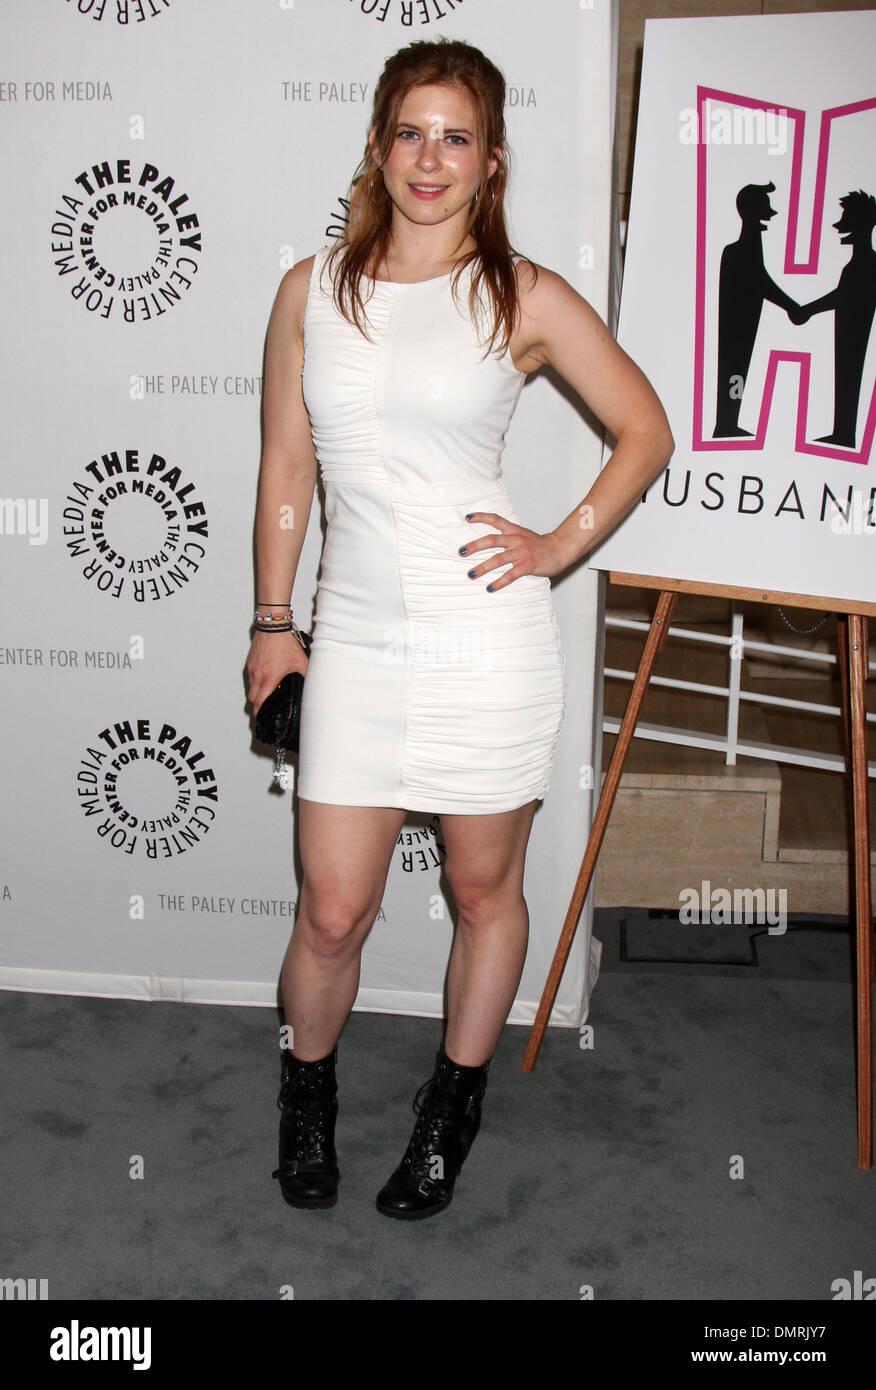 Katie Johnson (American actress),Charlie Cox (born 1982) XXX image Chloe Bridges,Richard Wilson (born 1936)